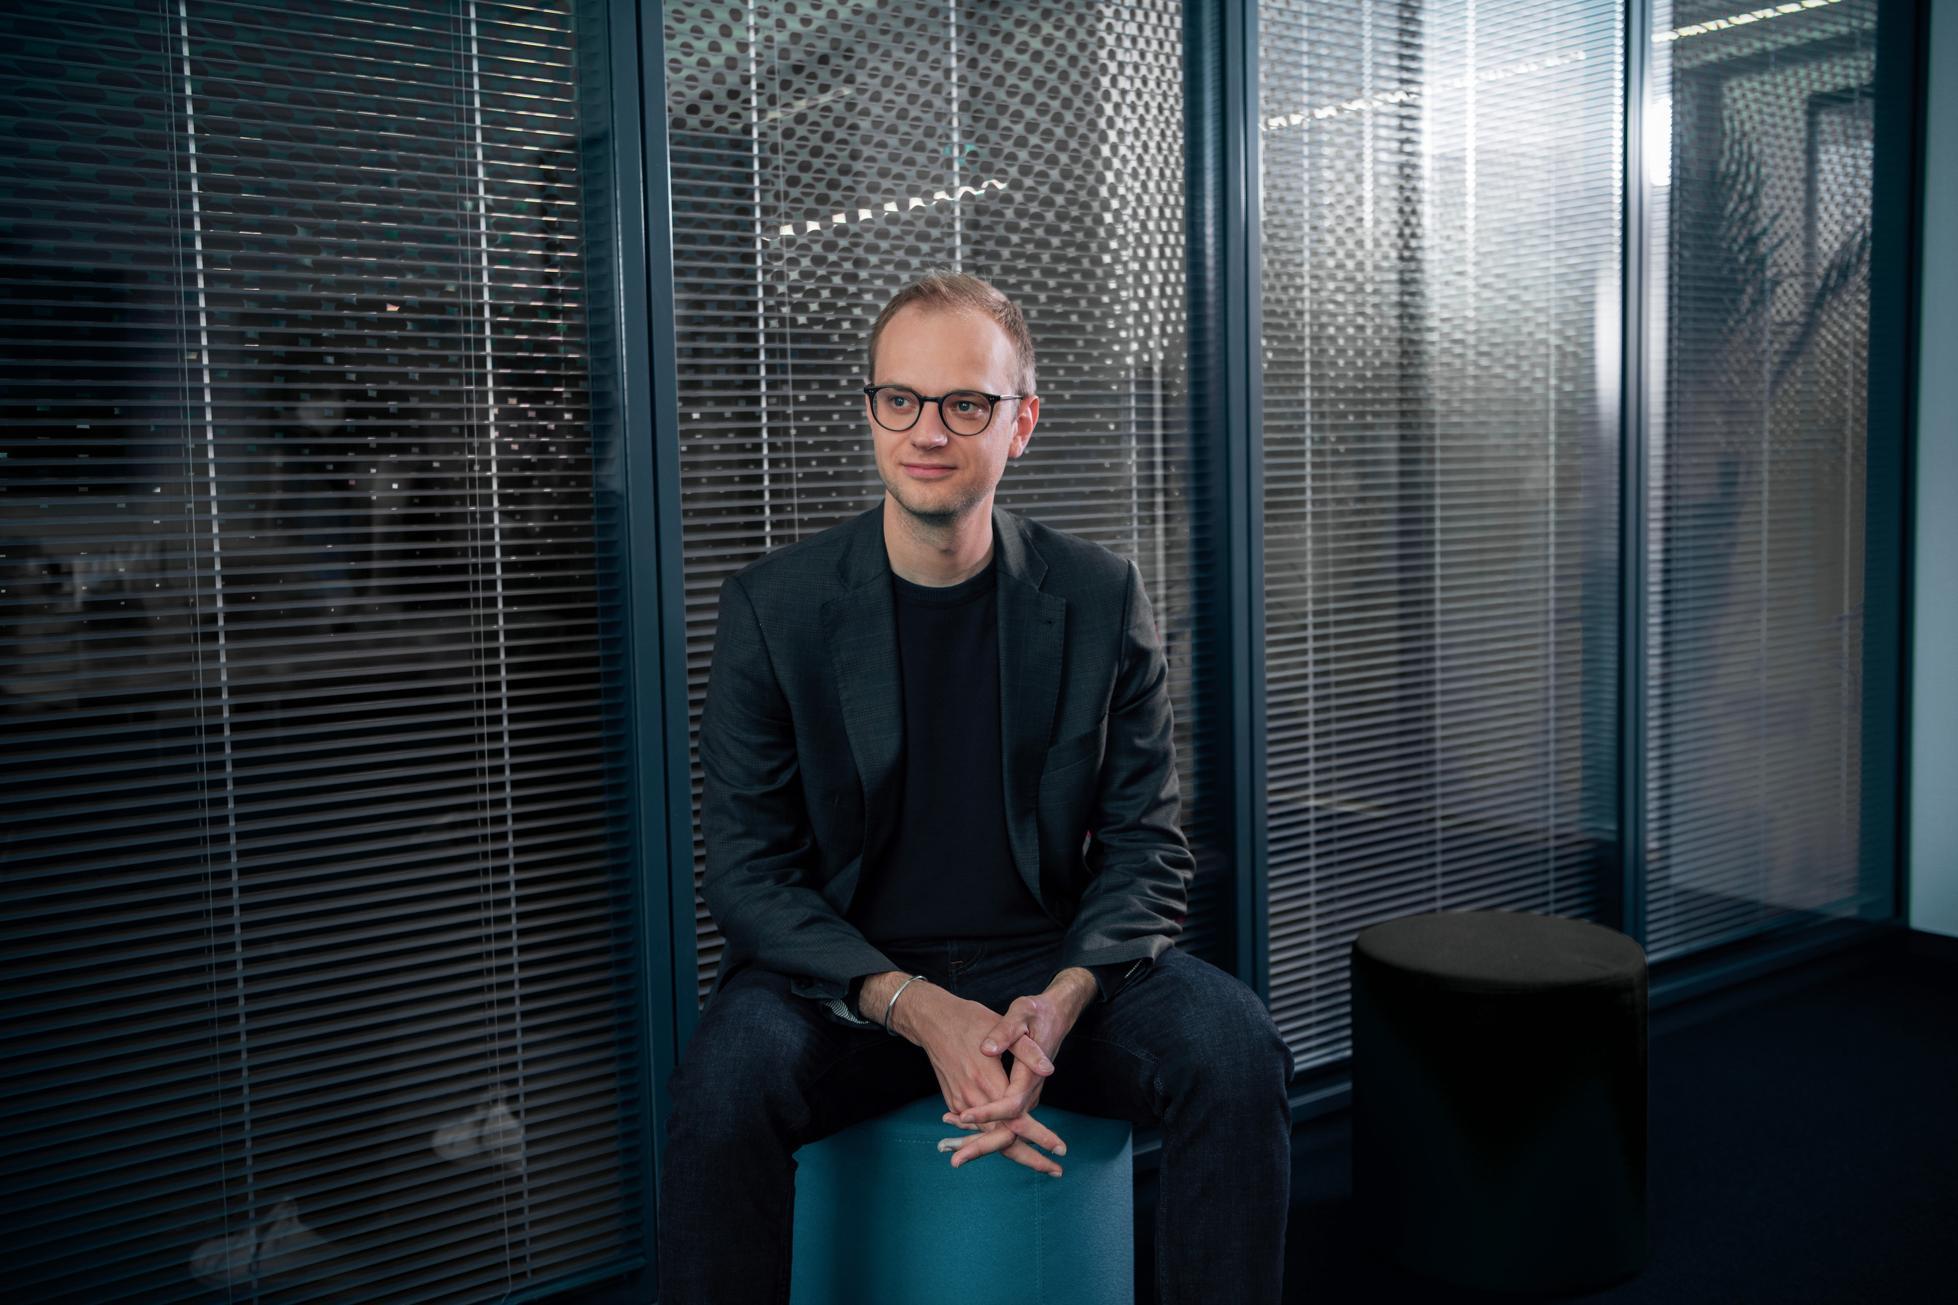 Celonis co-CEO Alexander Rinke raised $1 billion at an $11 billion valuation.